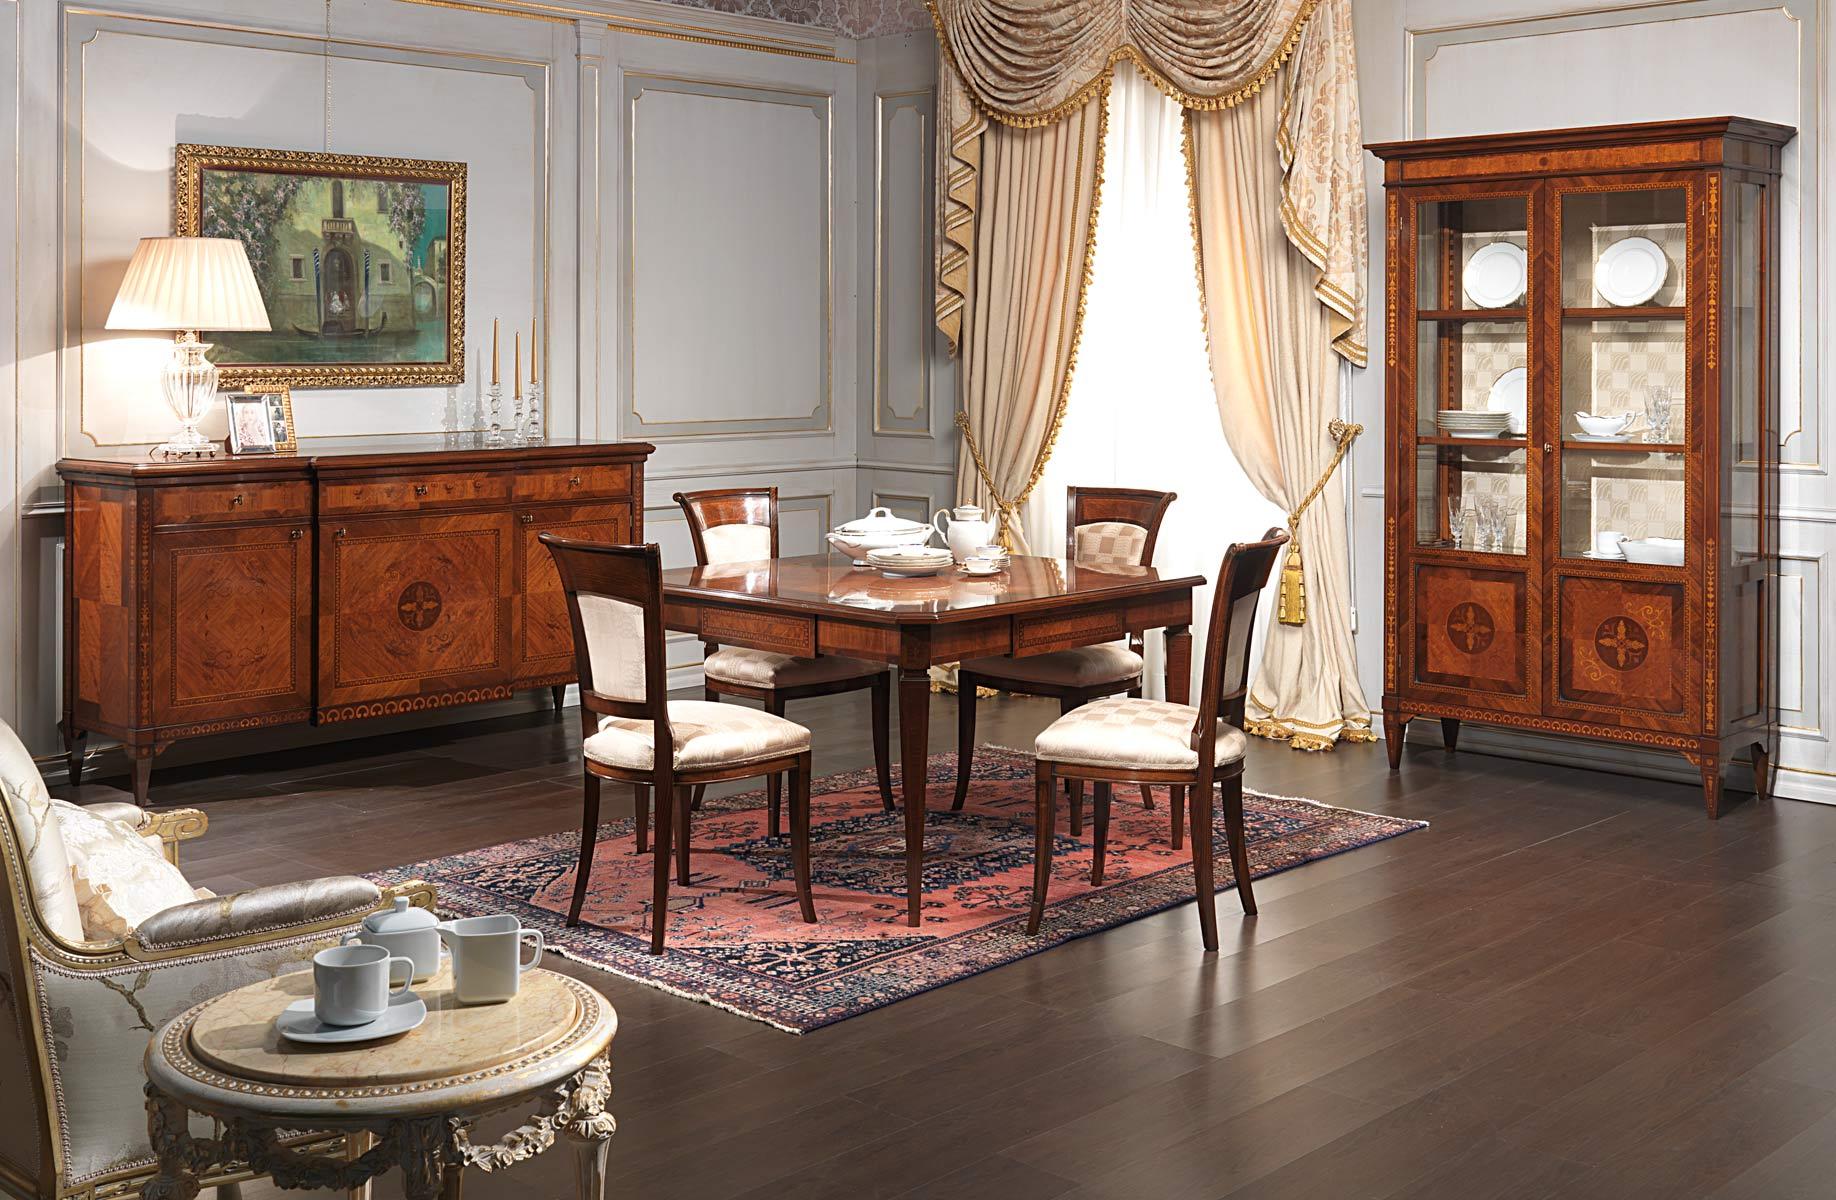 Sala da pranzo i maggiolini vimercati meda - Quadri per sala da pranzo ...